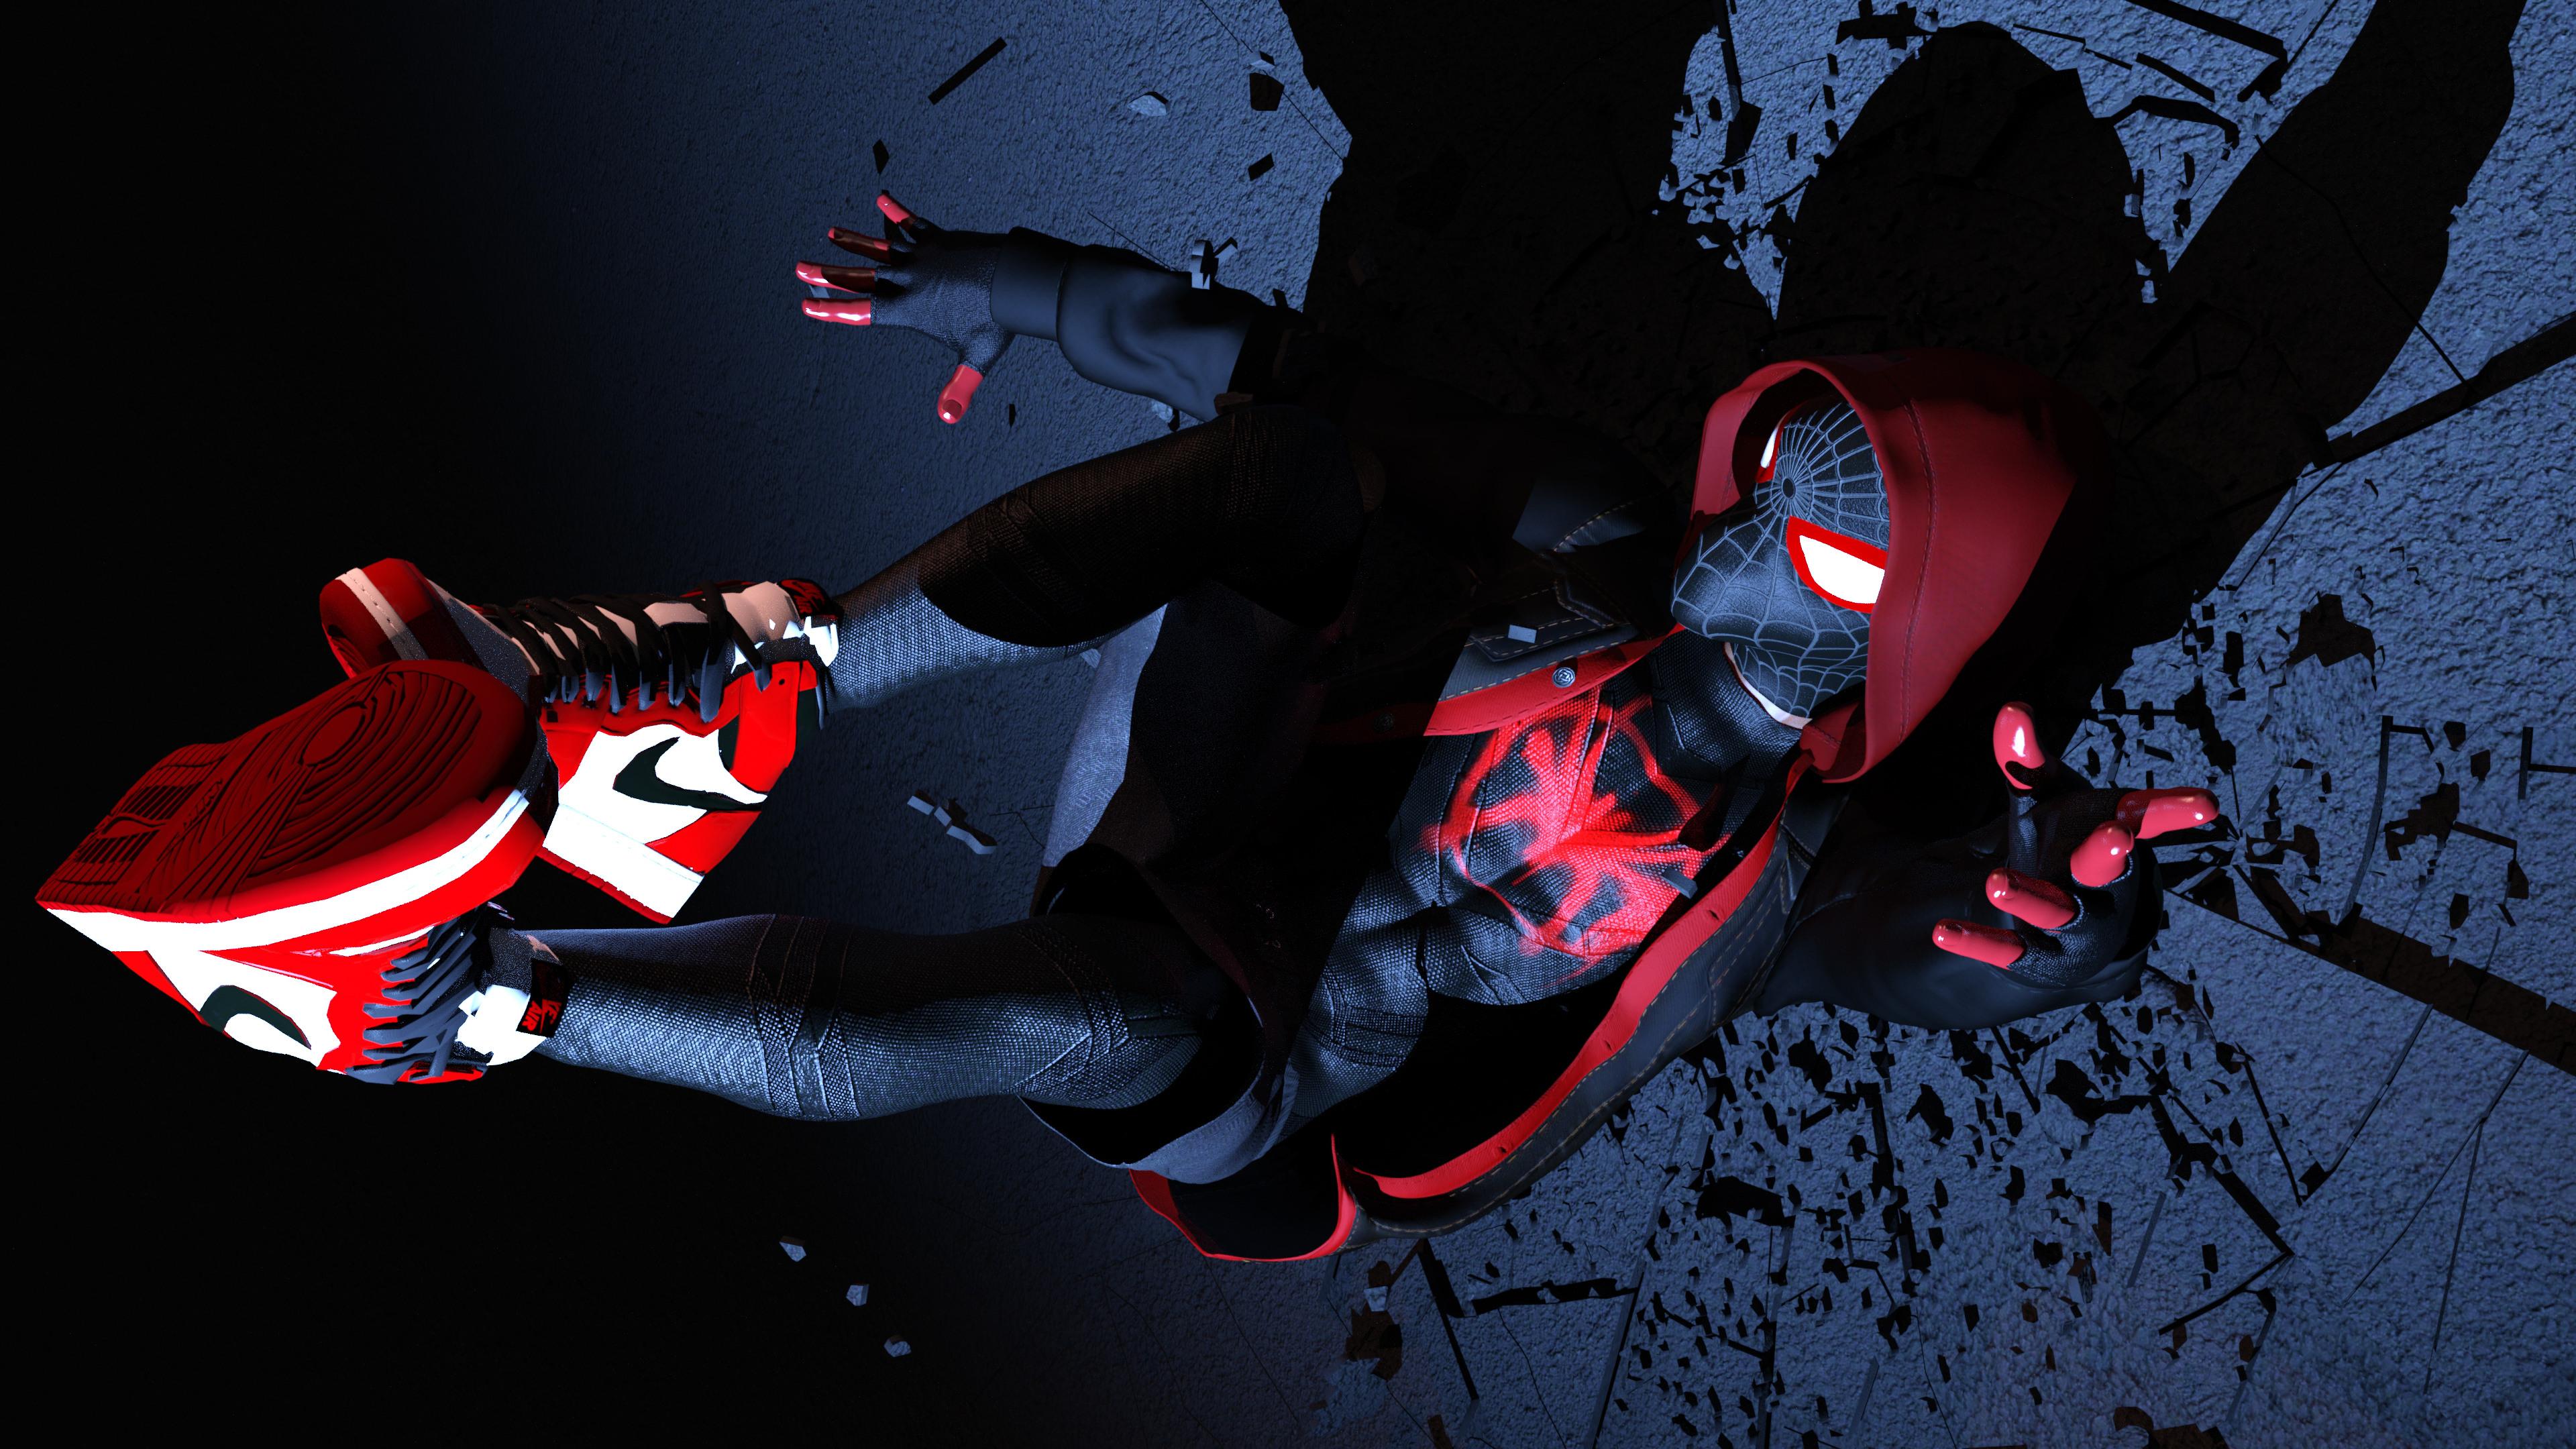 Wallpaper Spider Man 2099 Fan Art 4k Creative Graphics: Spiderman Miles Morales 4k Superheroes Wallpapers